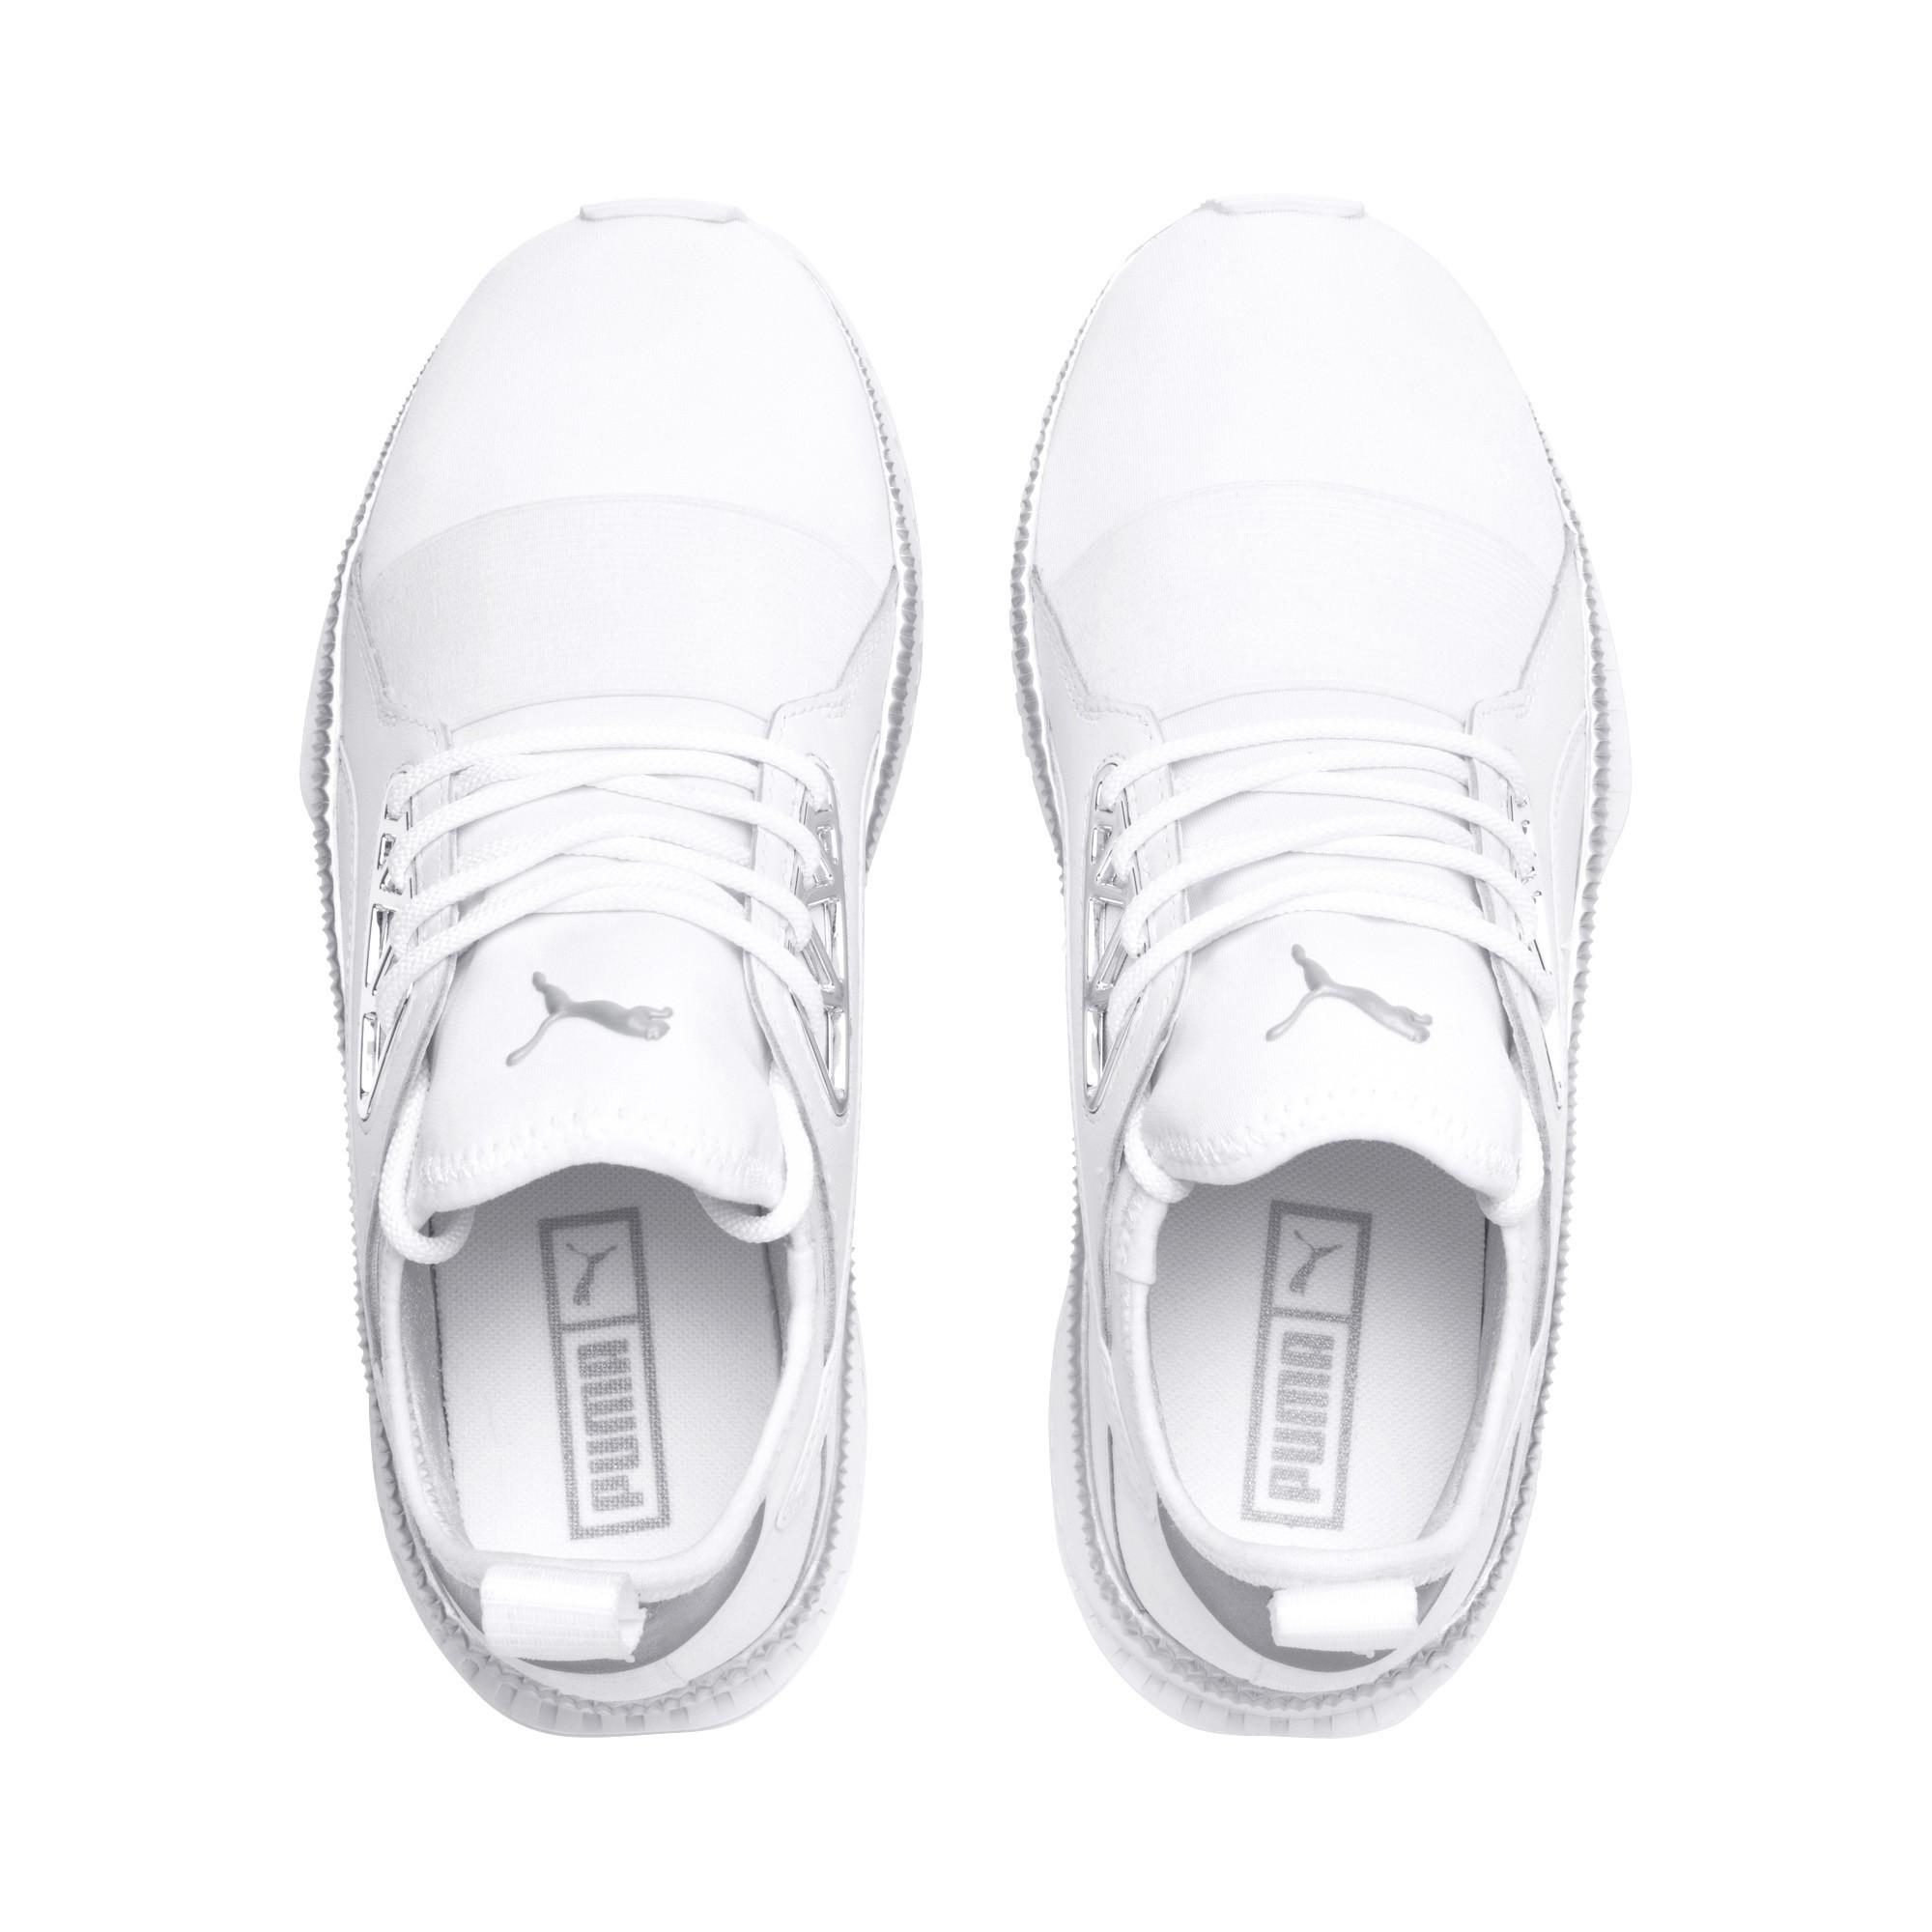 4c345a641d9 Lyst - PUMA Tsugi Apex Jewel Women s Sneakers in White - Save 14%